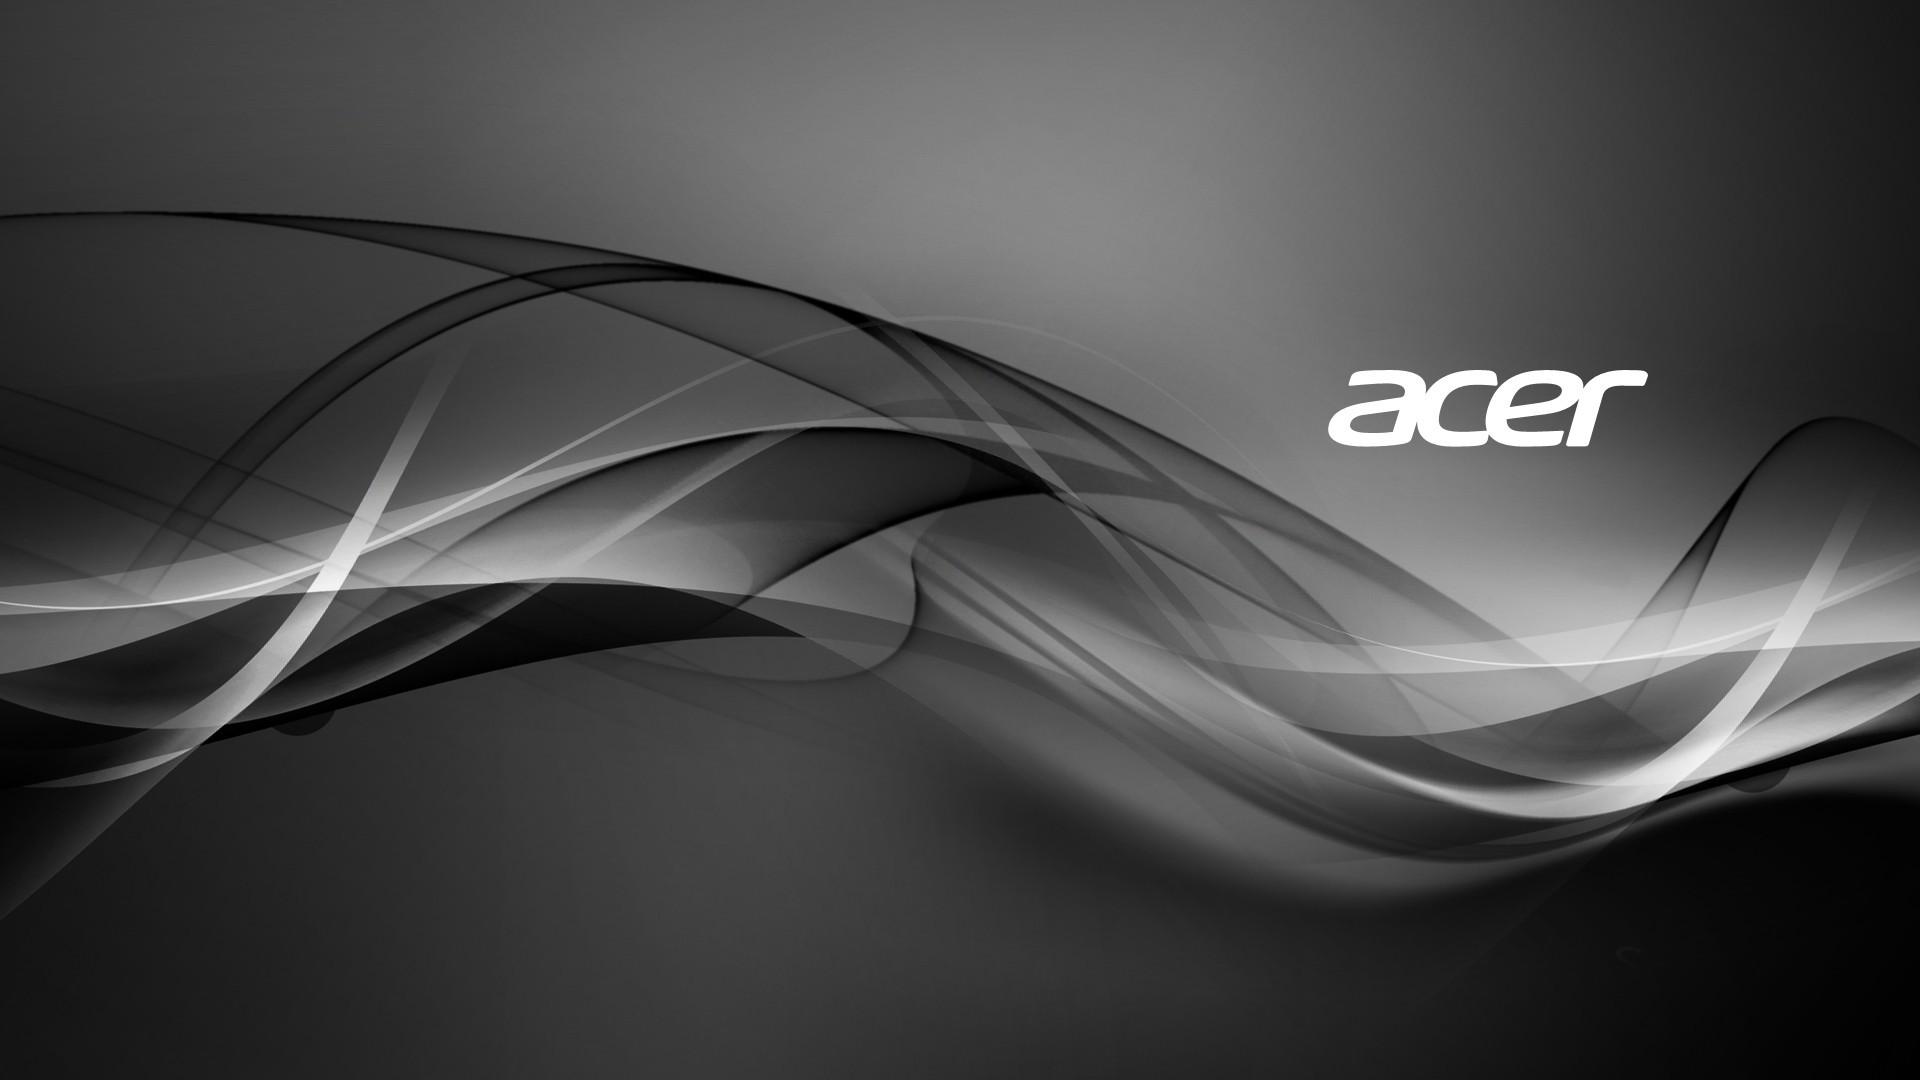 Acer Aspire black and white wallpaper (1080p) – Wallpaper .